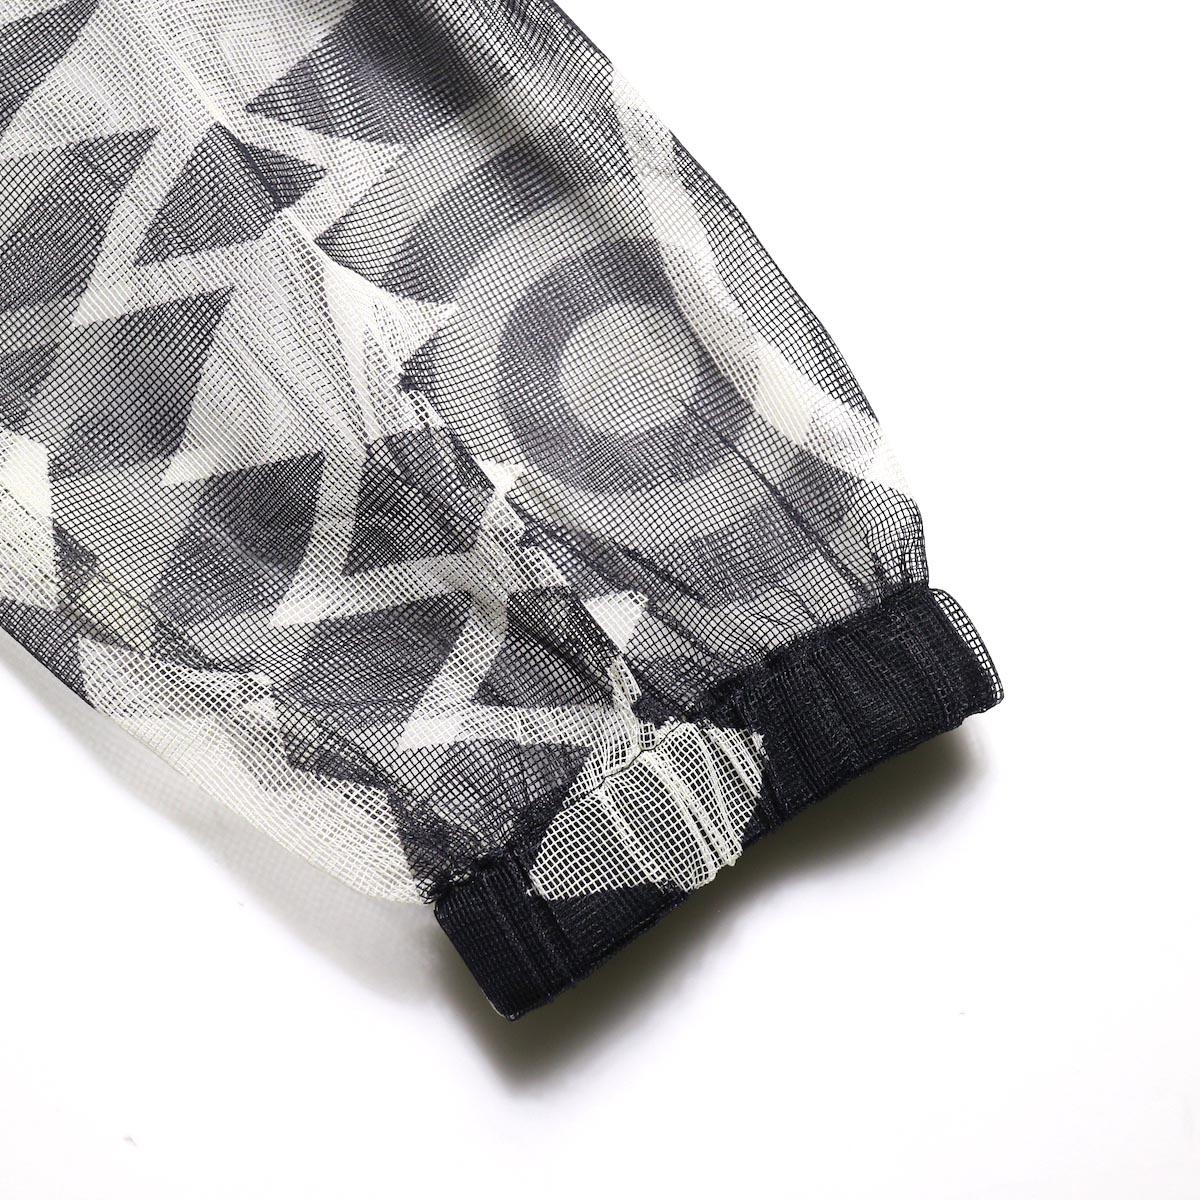 South2 West8 / BUSH SHIRT - Poly Lightweight Mesh / Print (Skull&Target)袖